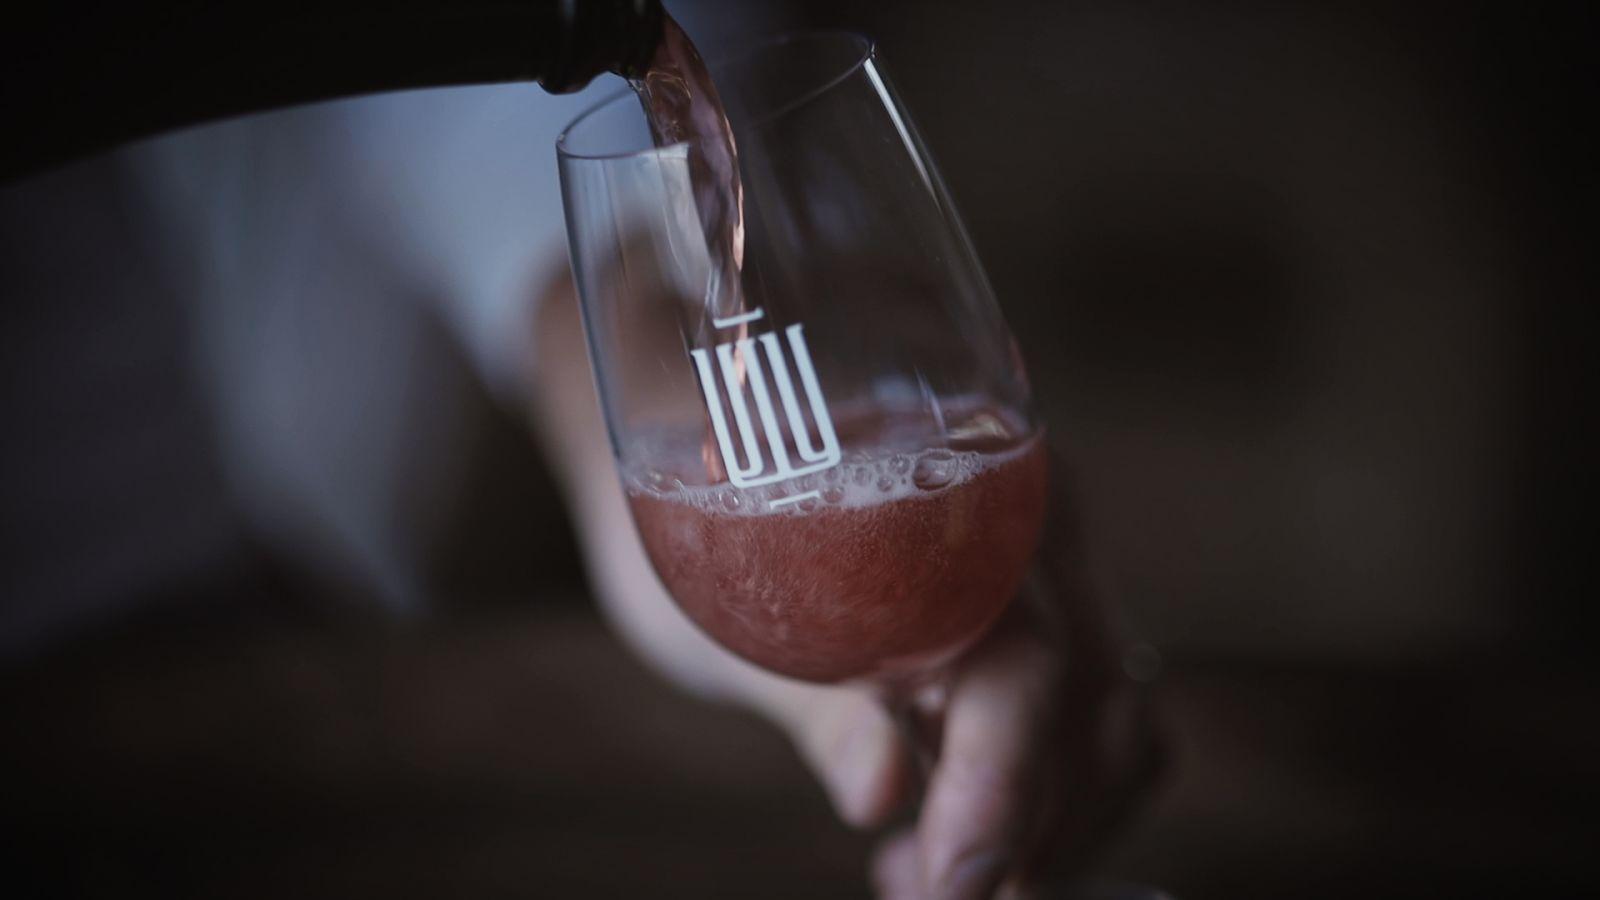 Topher Boehm / Wildflower Brewing